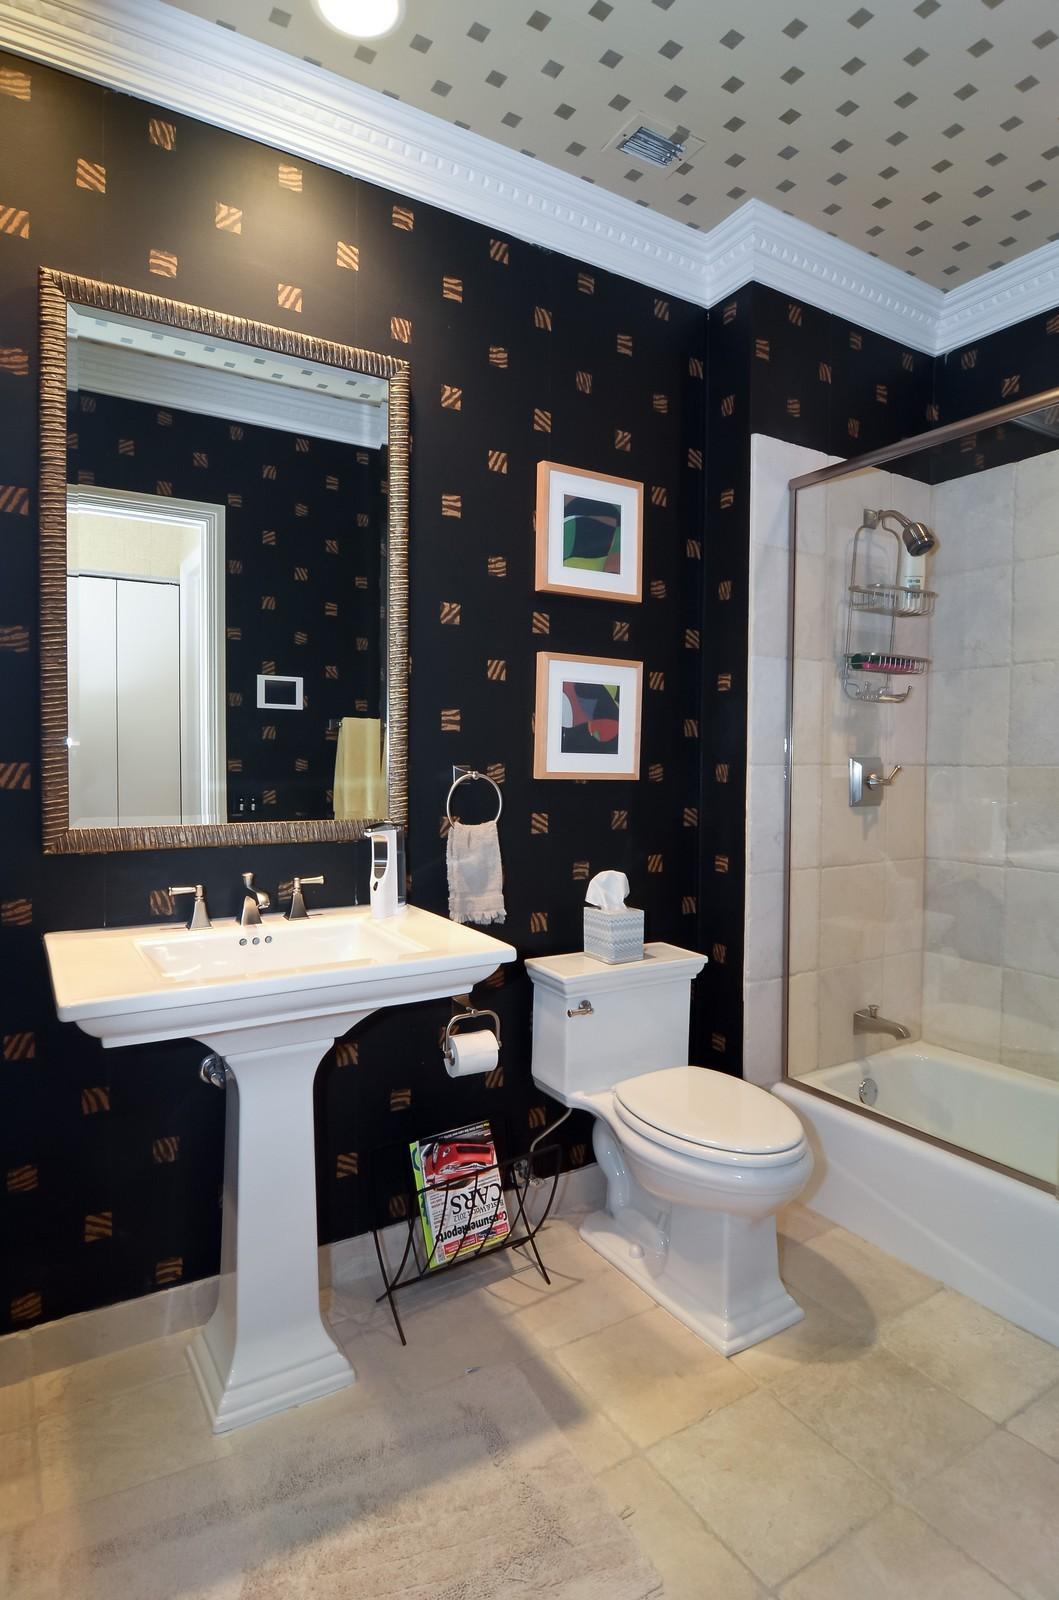 Real Estate Photography - 530 N Lake Shore Drive, Unit 2800, Chicago, IL, 60611 - Bathroom